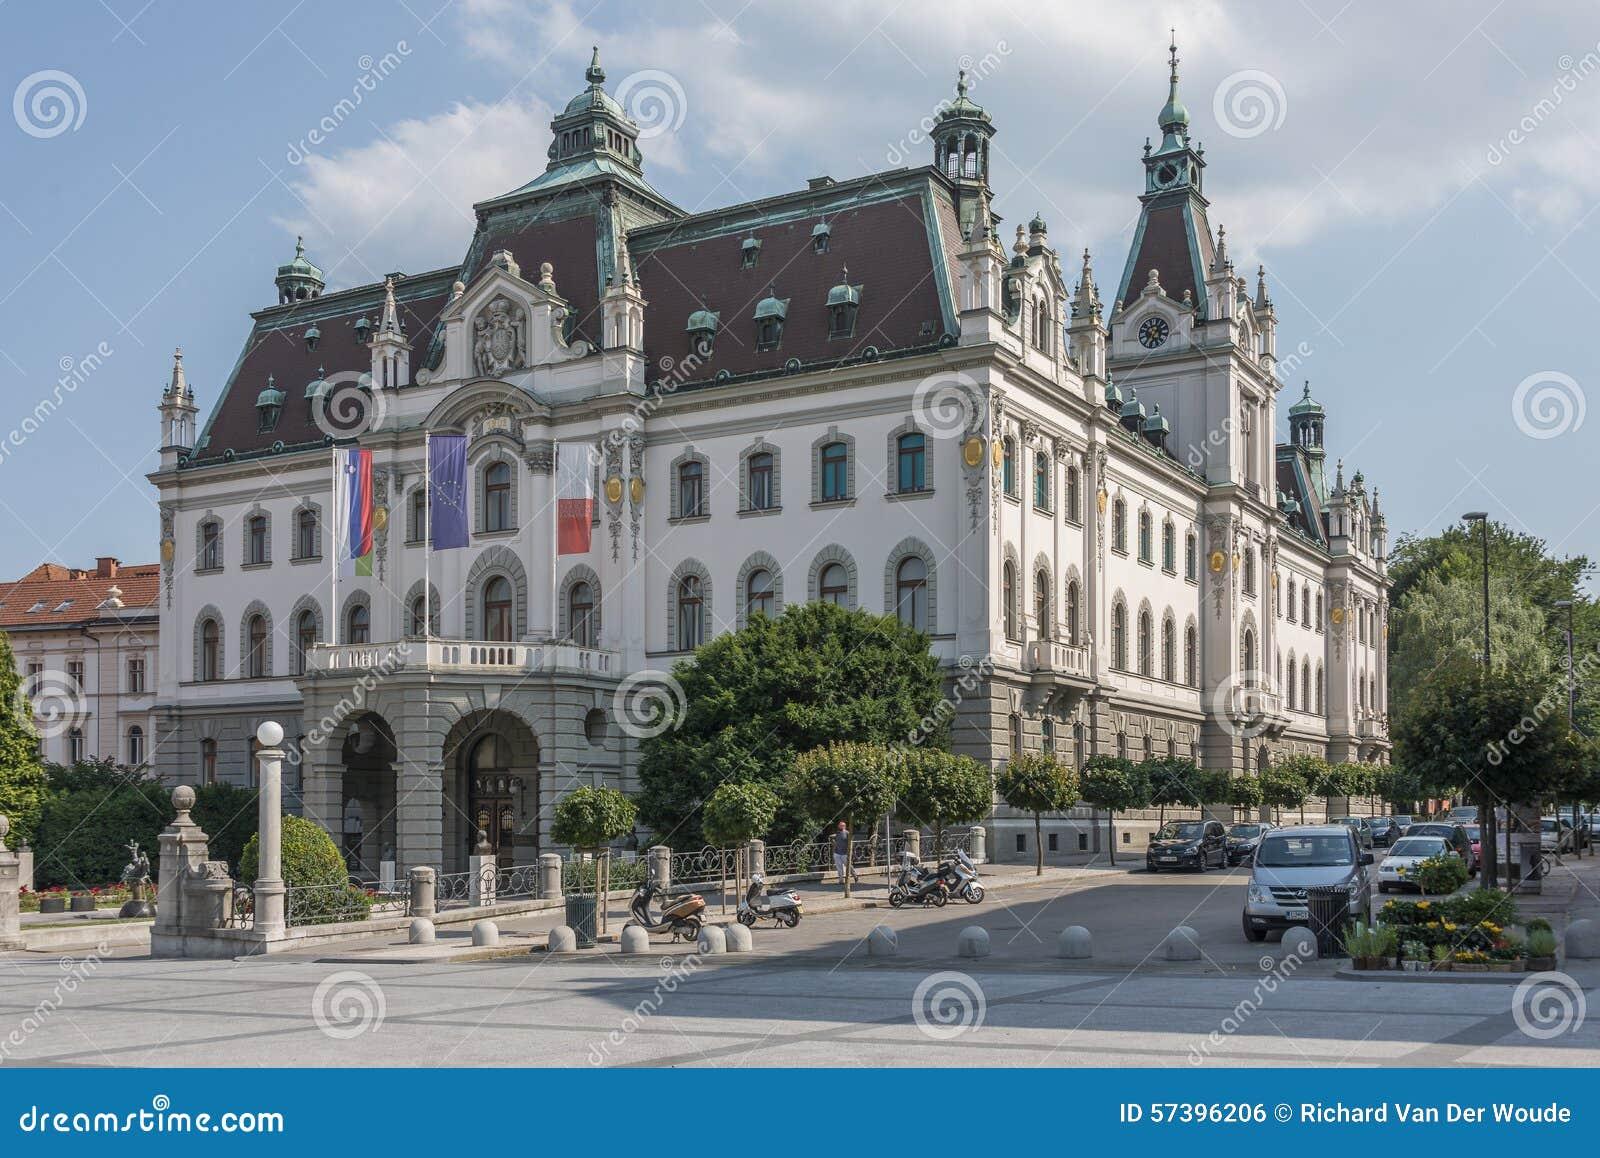 Universiteit van Ljubljana, Slovenië, Europa